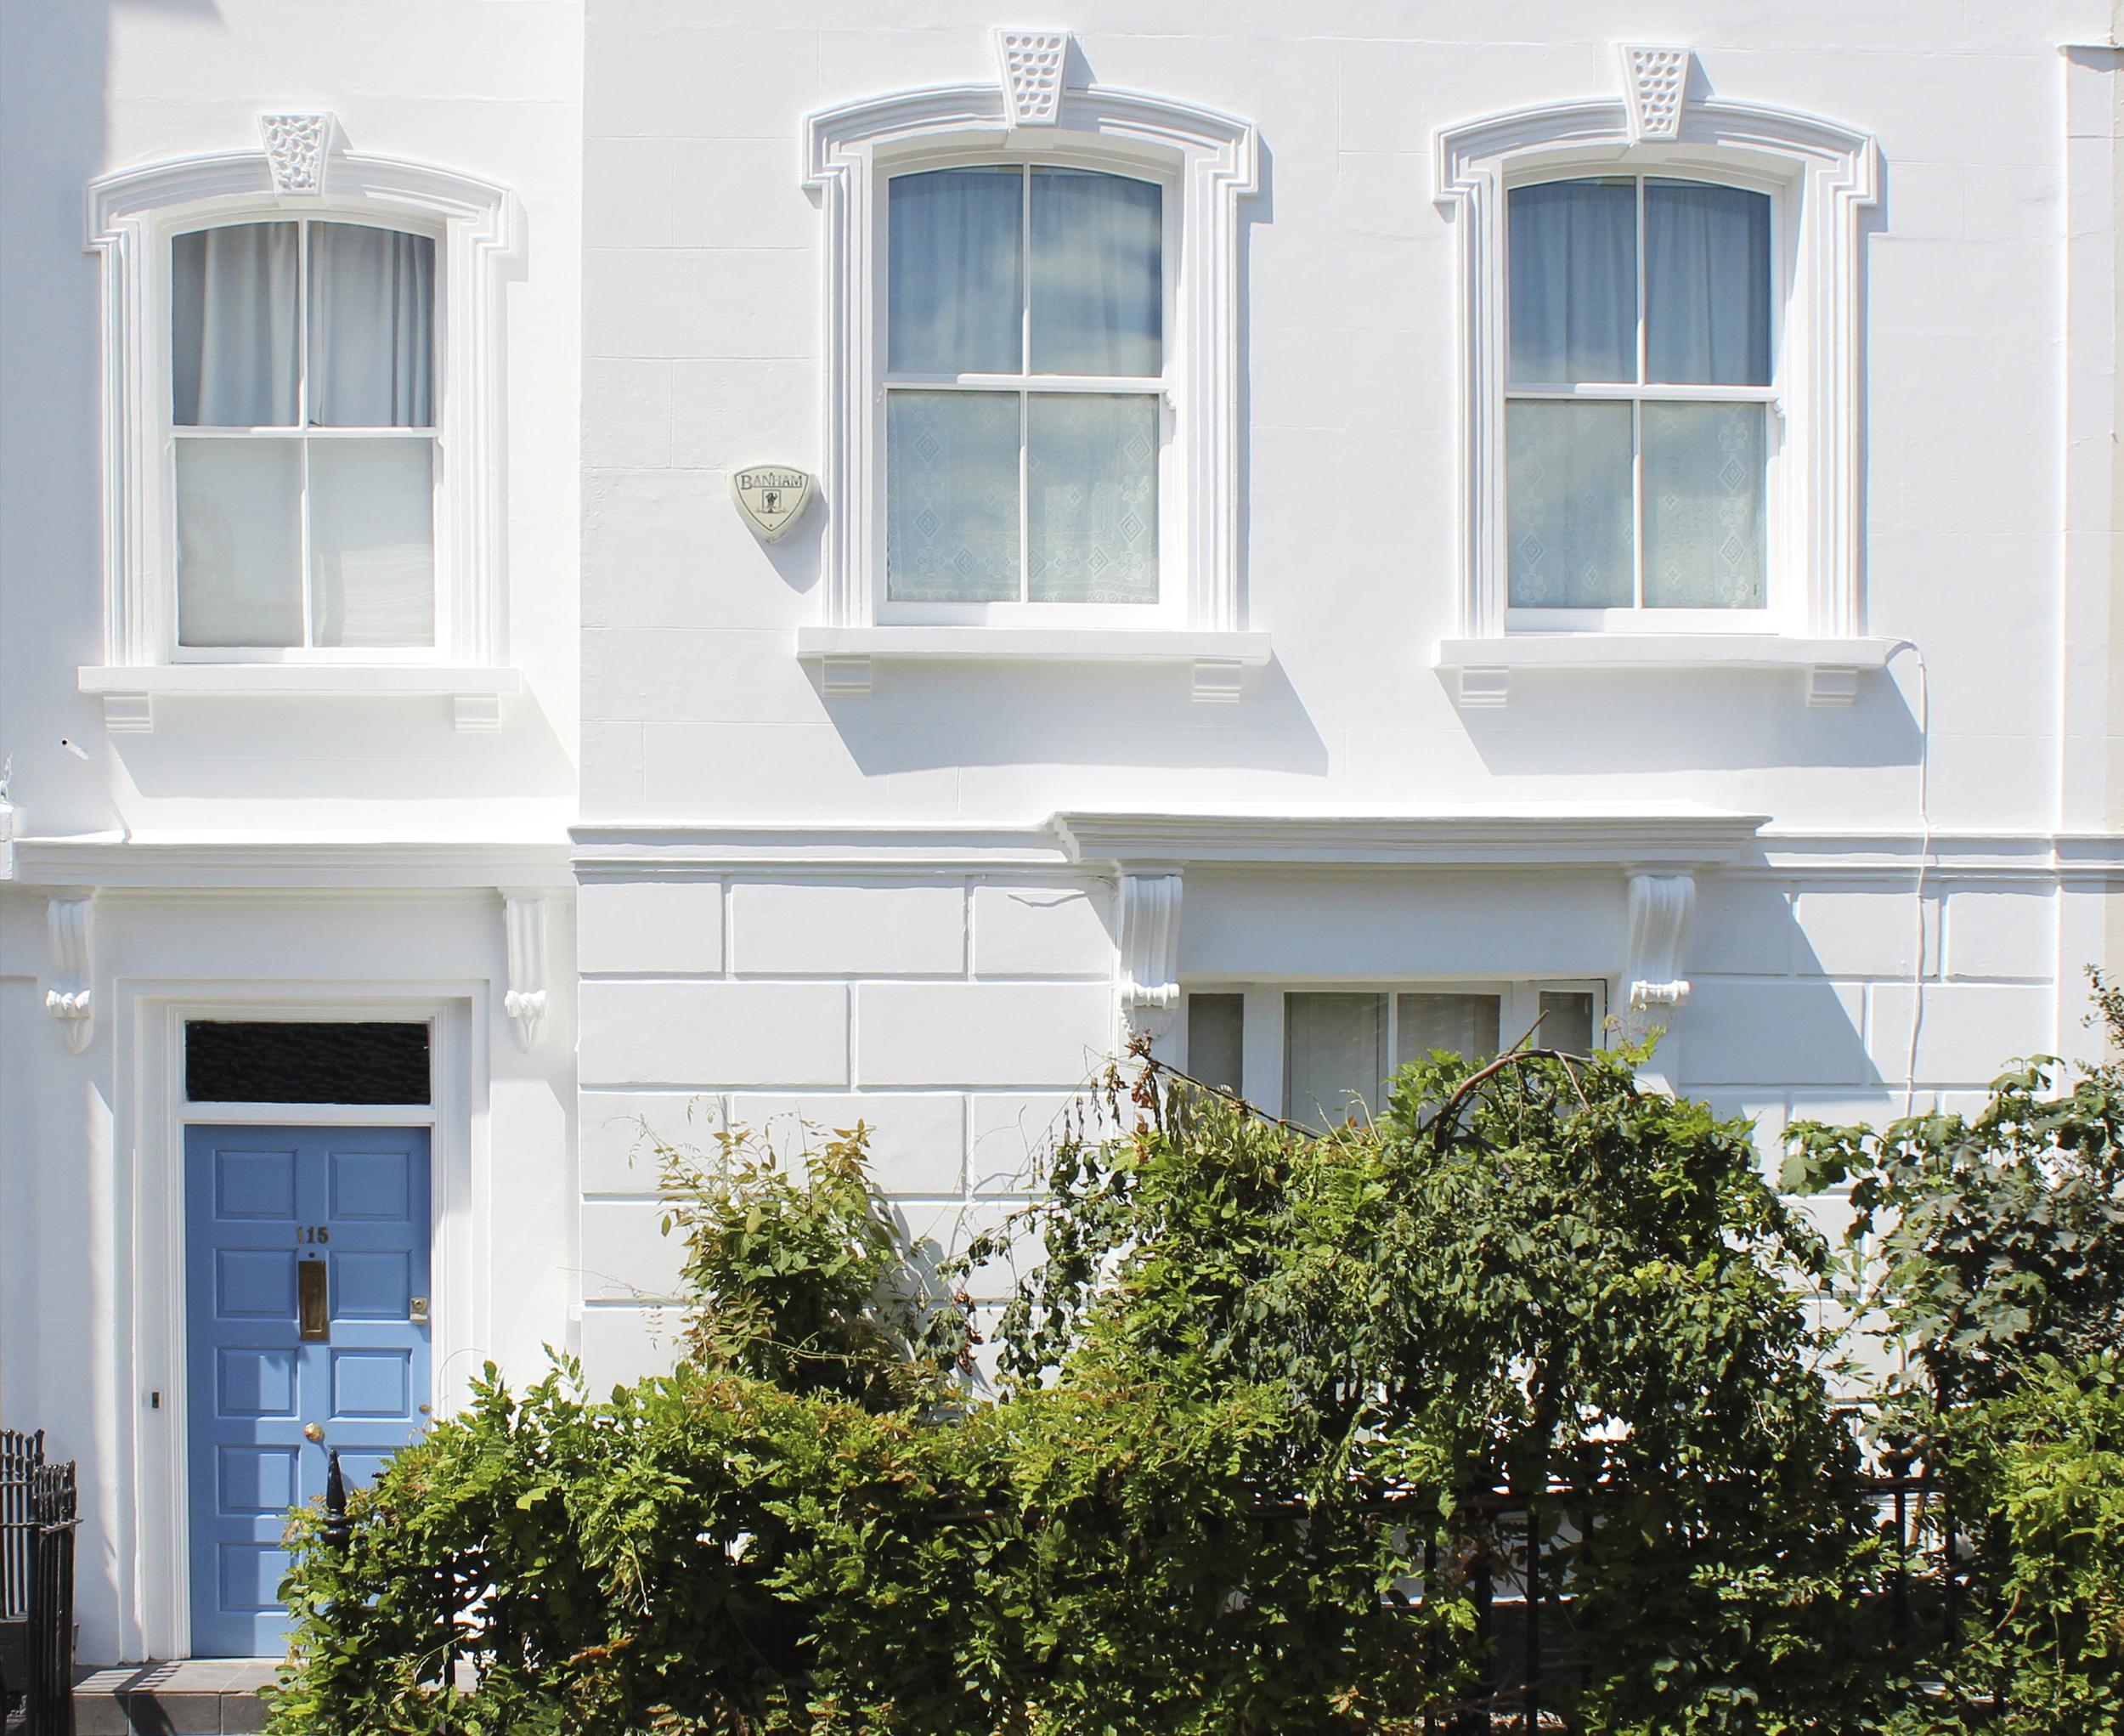 #NHRenovations #Painter #Decorator #London #Kentishtown #Kentish #Listedbuilding #Windows #Masonry #Limeplaster #Frontdoor #Keim #Keimminerals #Keystones #Exterior #Building